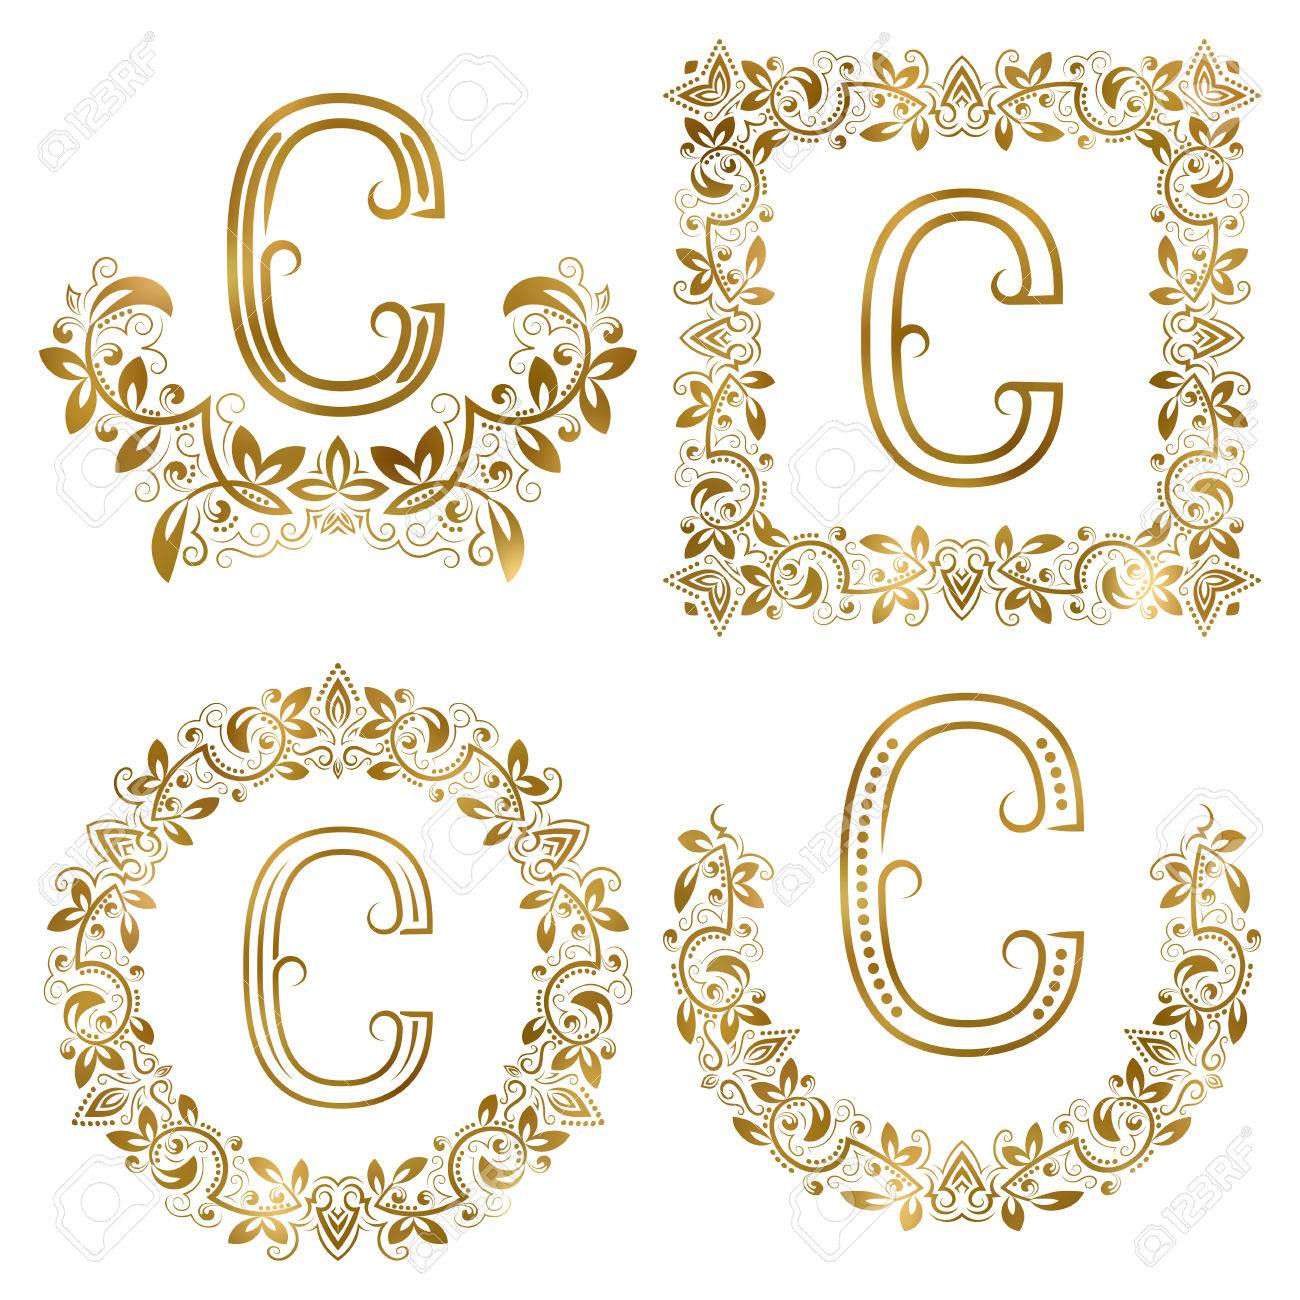 Golden c letter ornamental monograms set heraldic symbols in golden c letter ornamental monograms set heraldic symbols in wreaths square and round frames buycottarizona Image collections